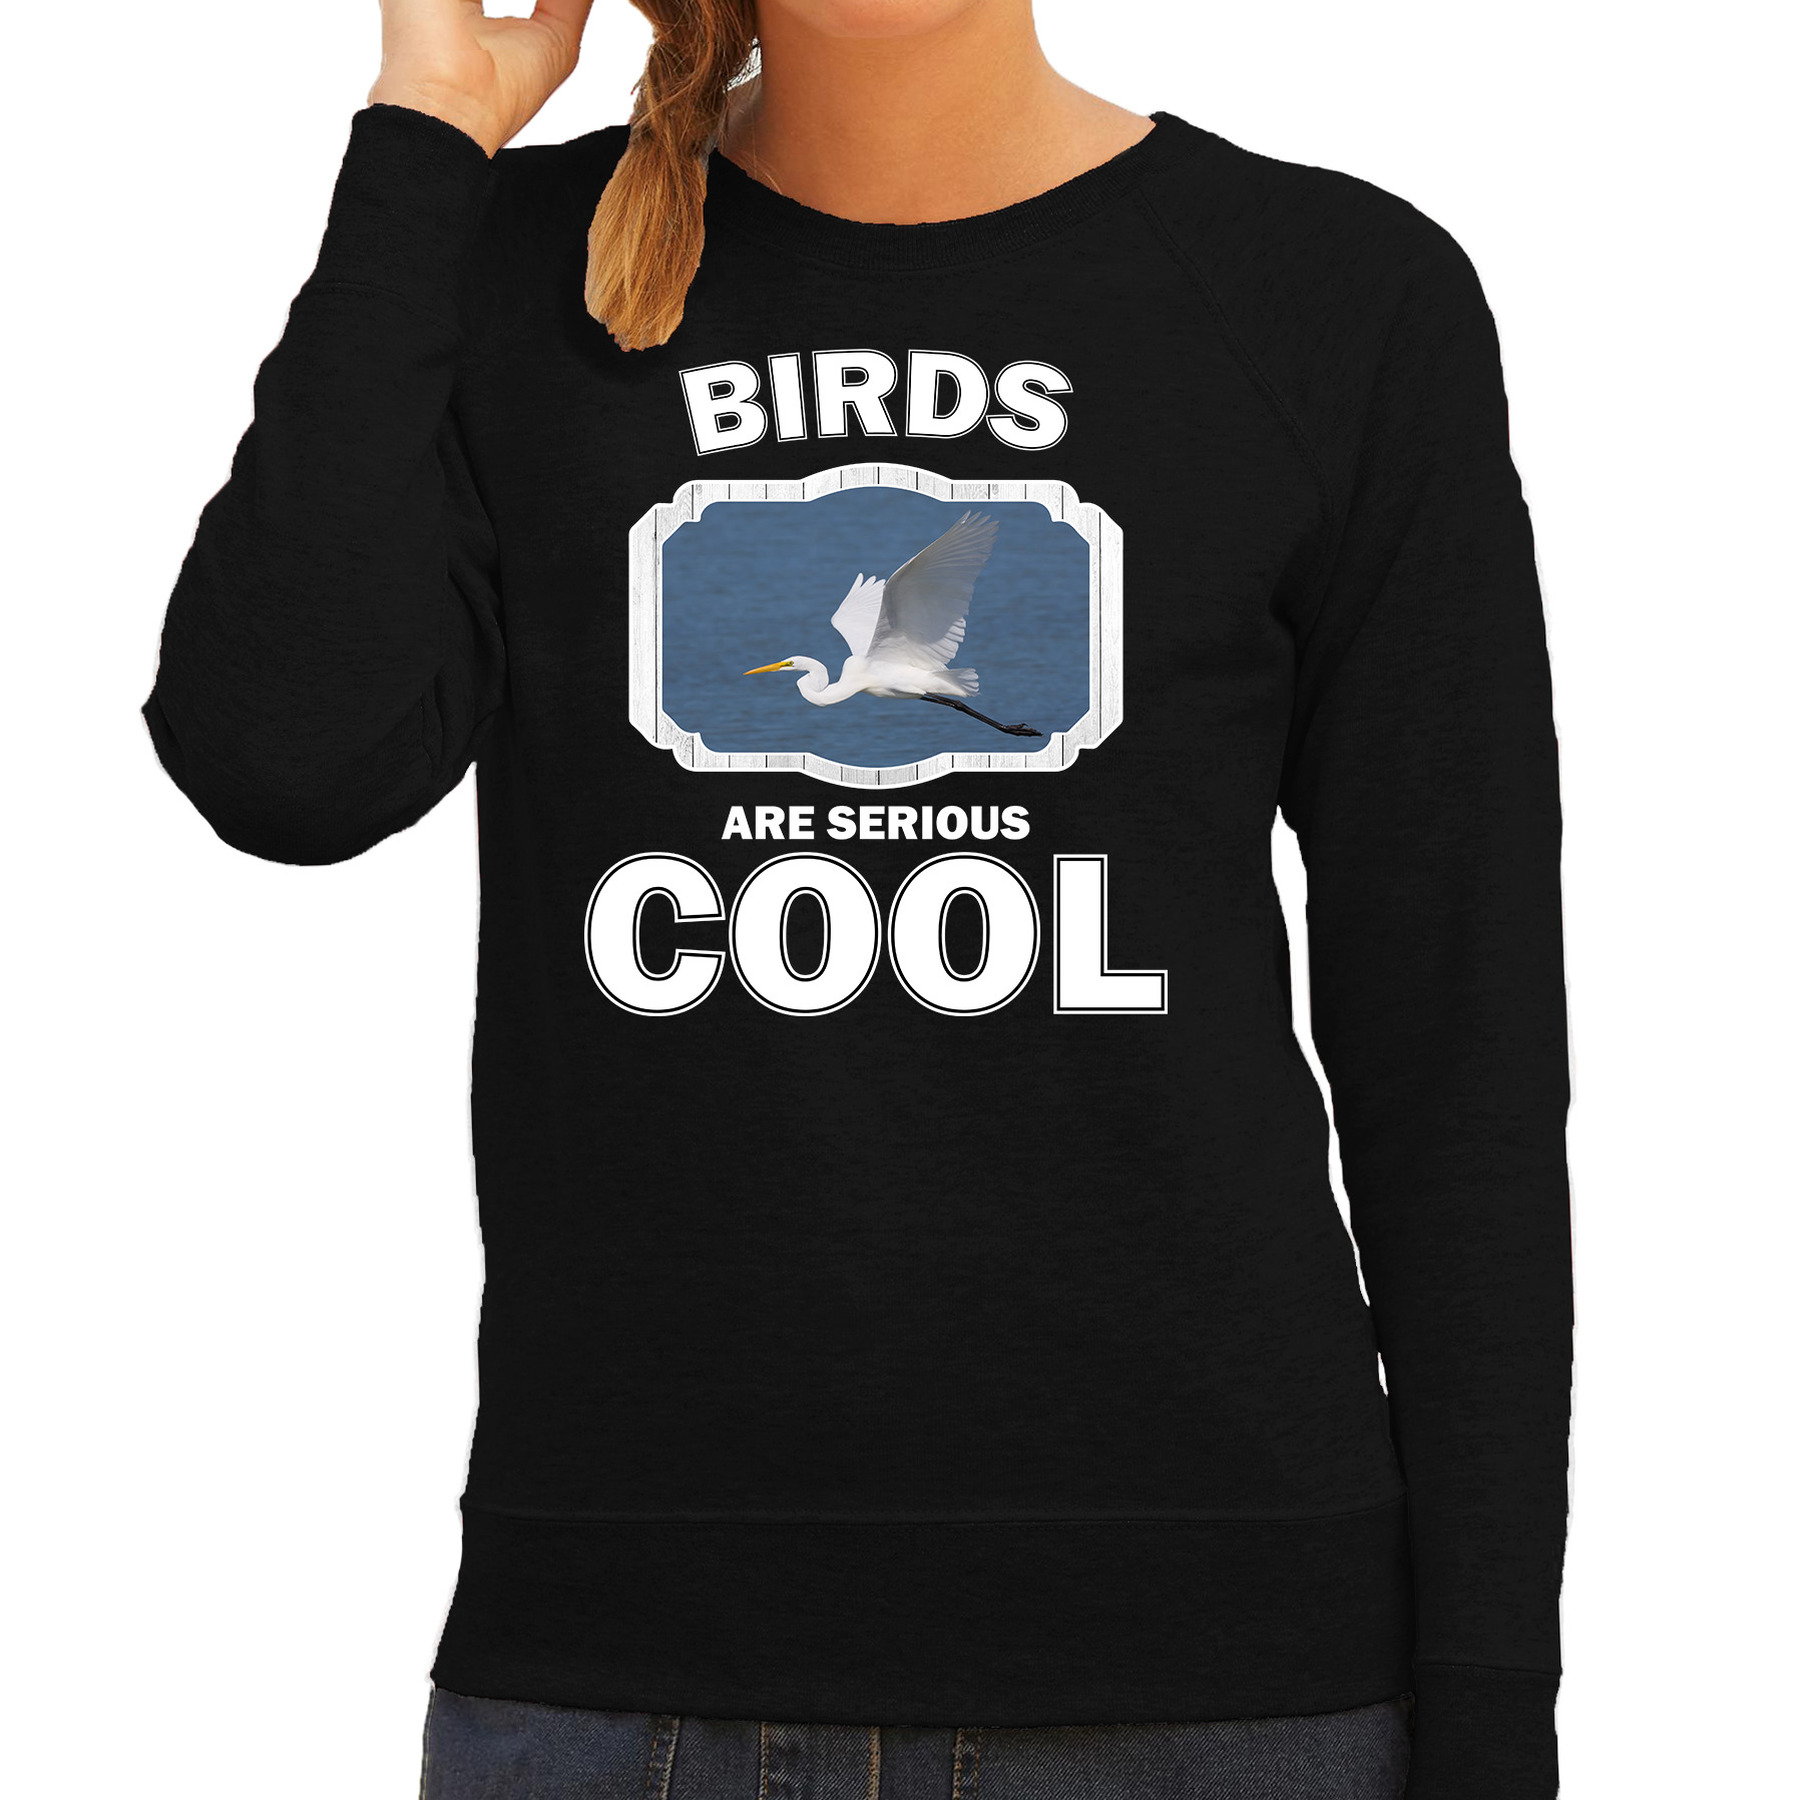 Sweater birds are serious cool zwart dames - vogels/ grote zilverreiger trui